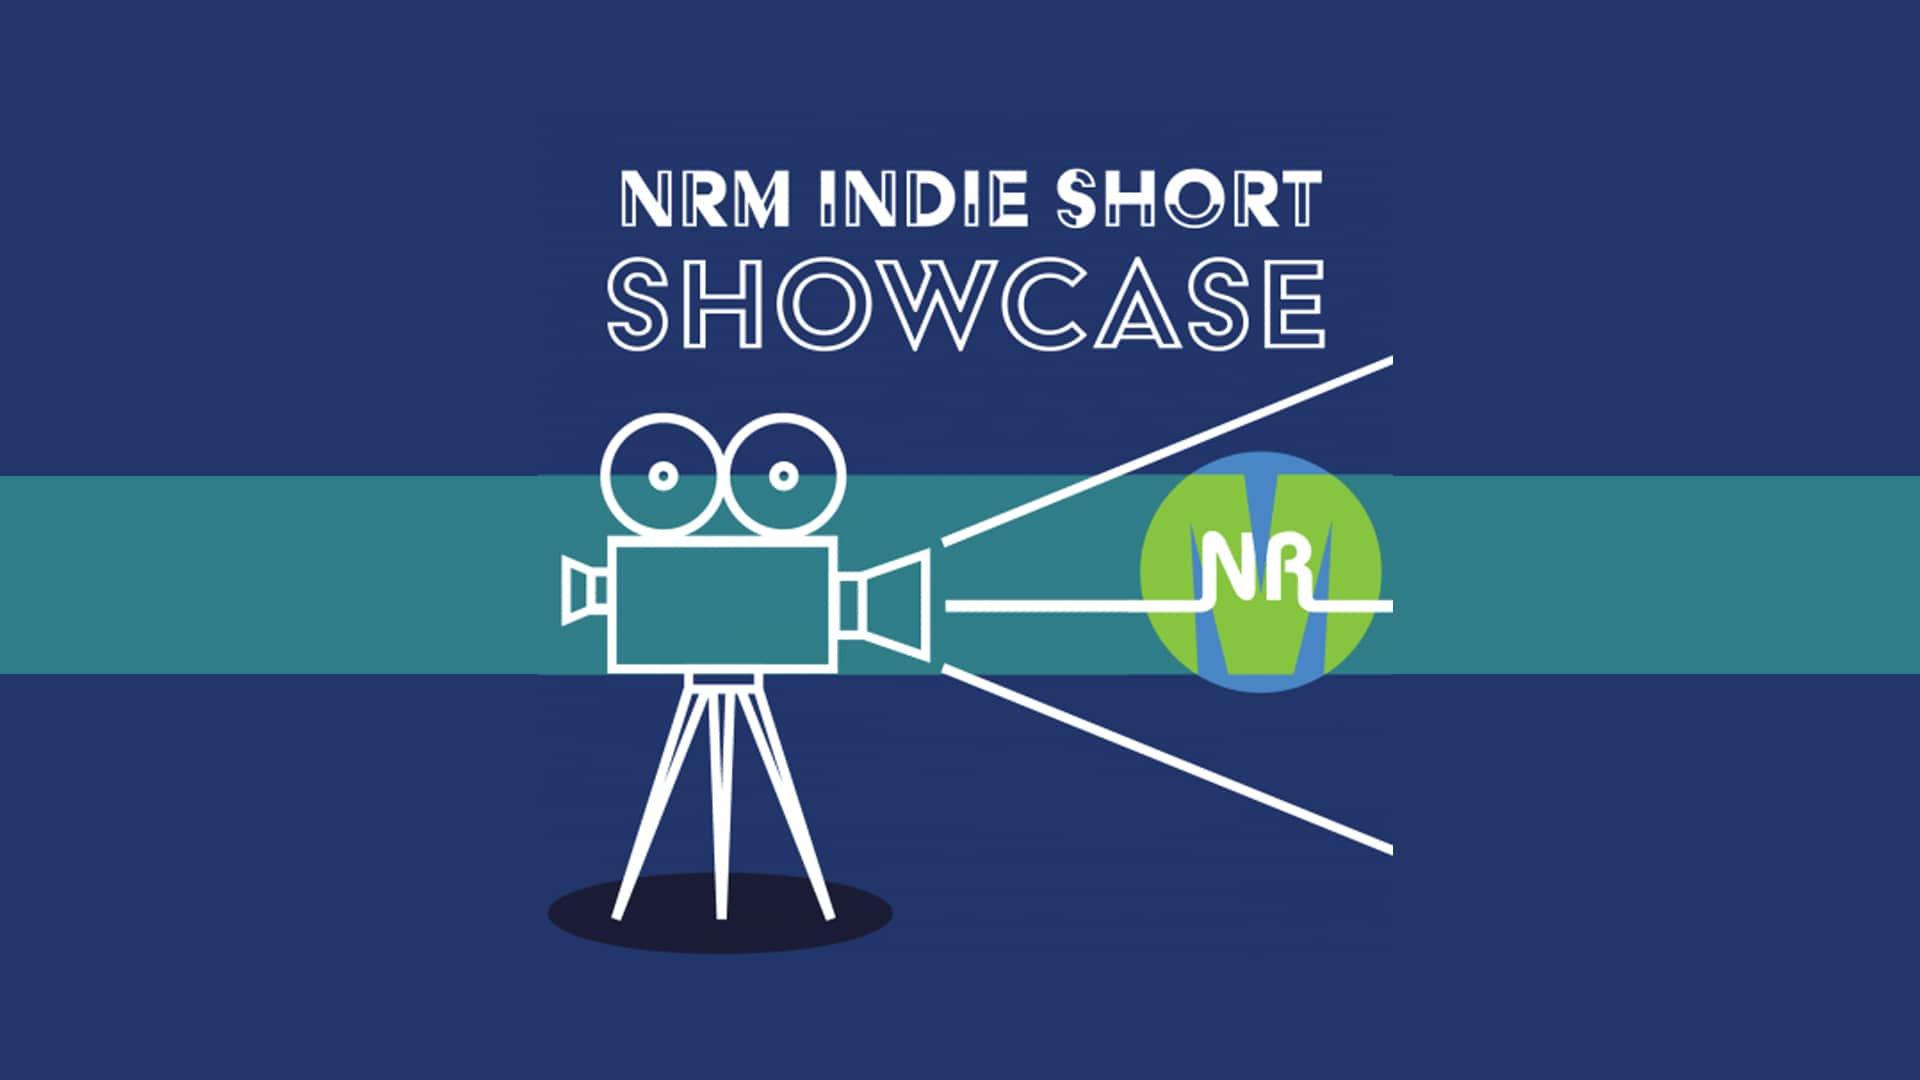 NRM Indie Short Showcase